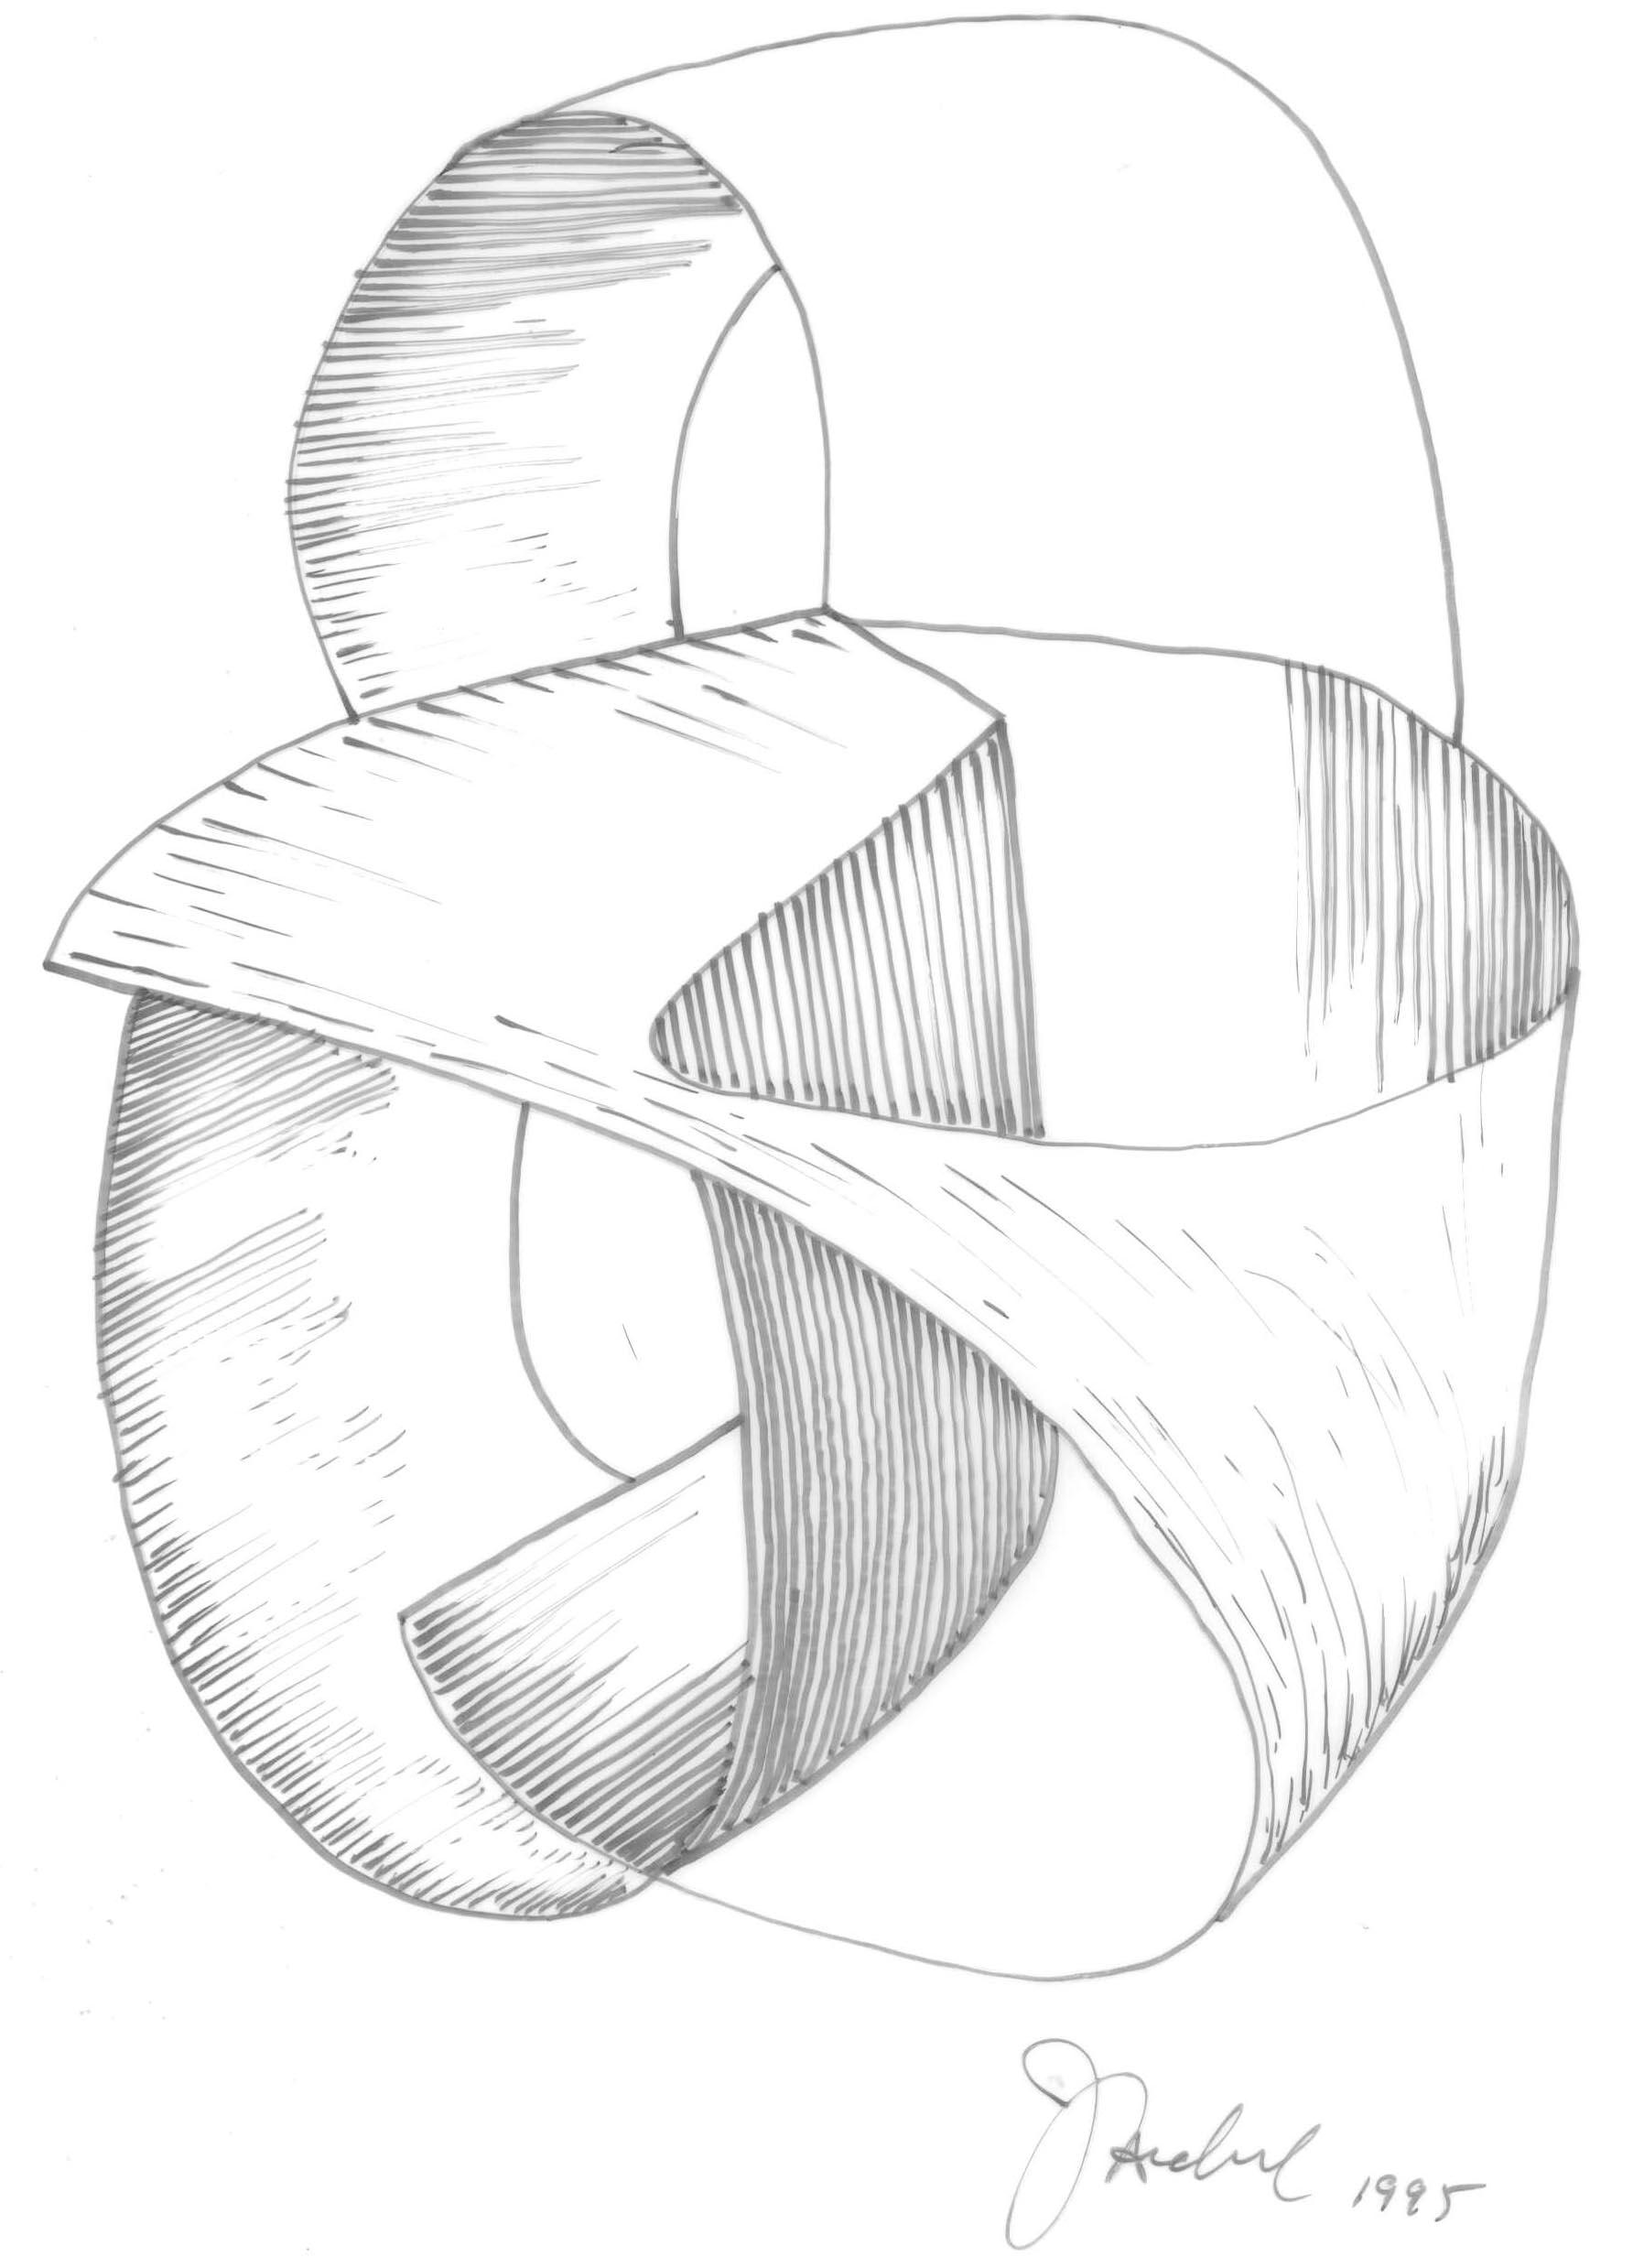 Continuity . Concept sketch